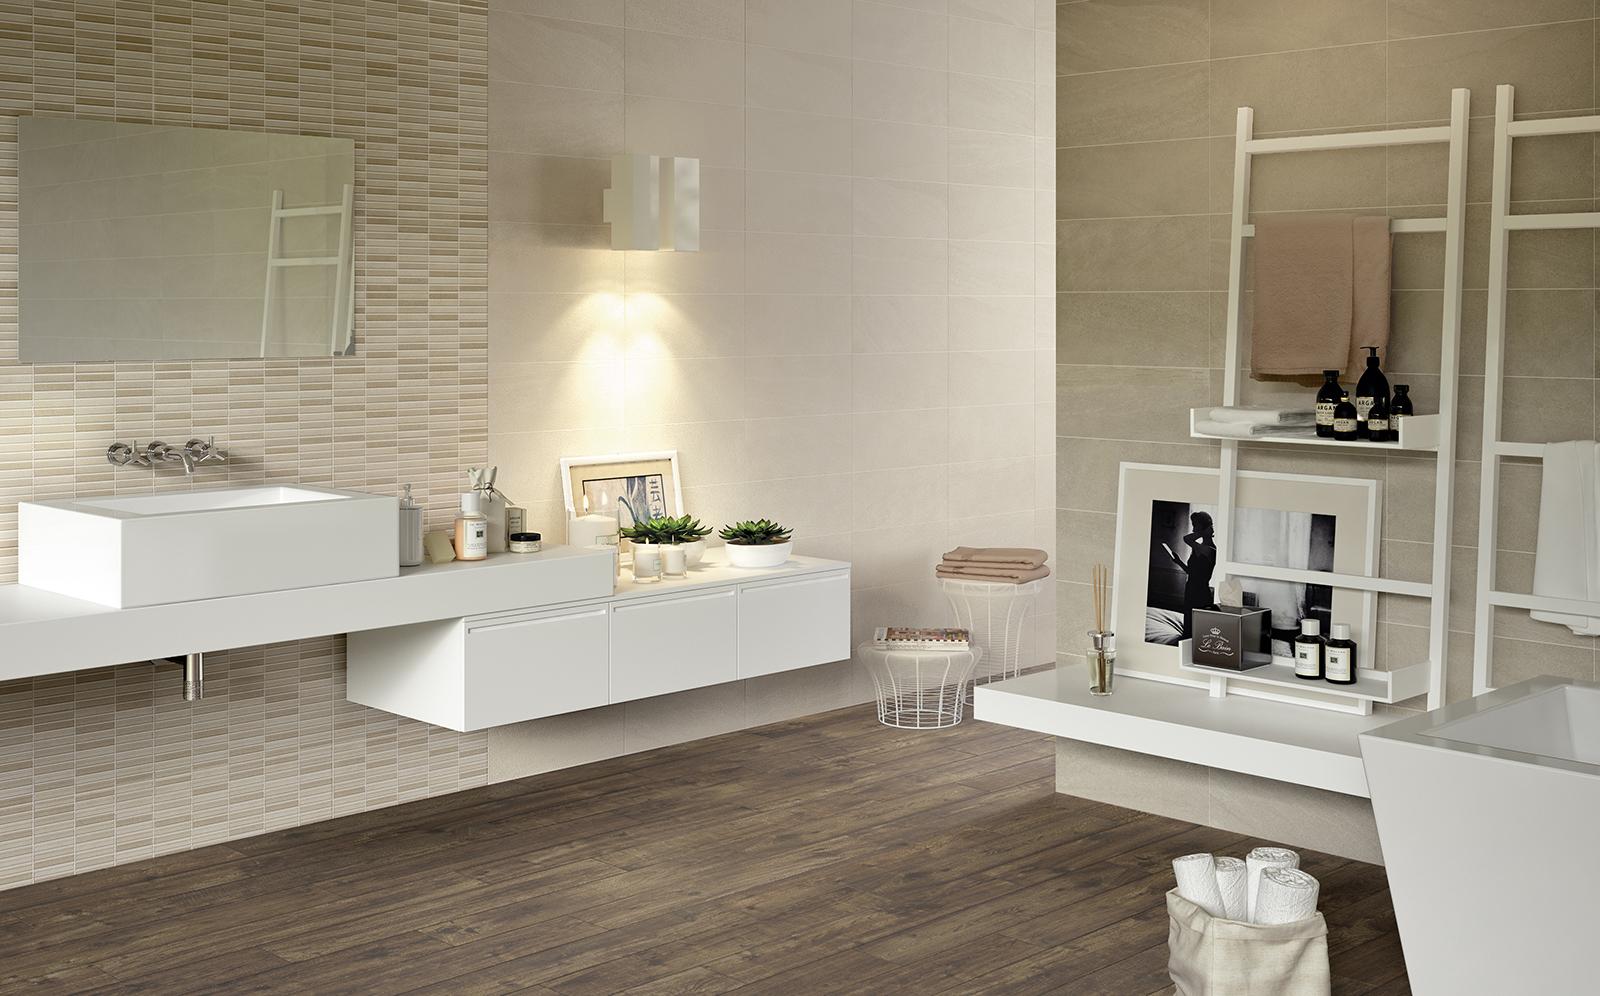 Interiors rivestimento bagno e cucina marazzi - Piastrelle cucina ...